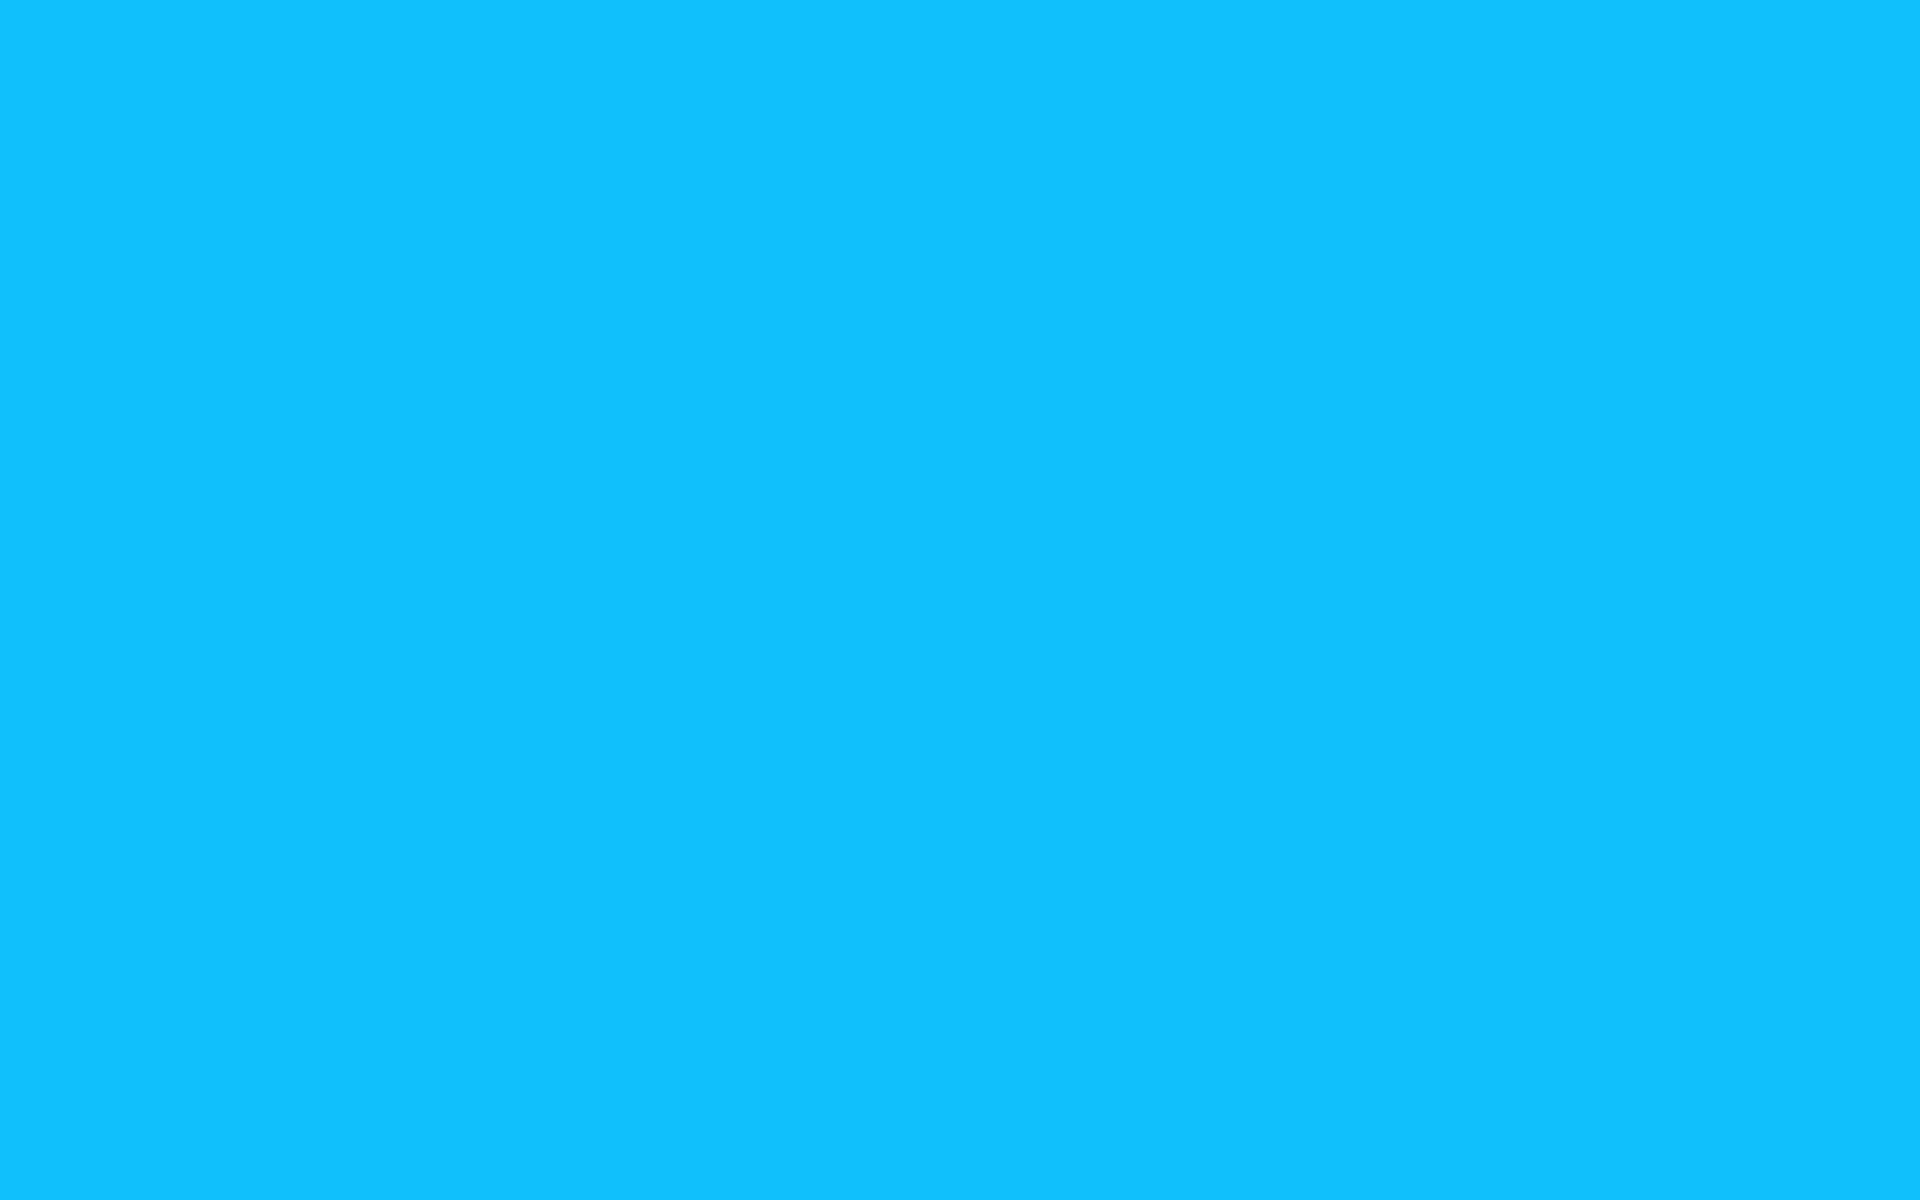 1920x1200 Spiro Disco Ball Solid Color Background